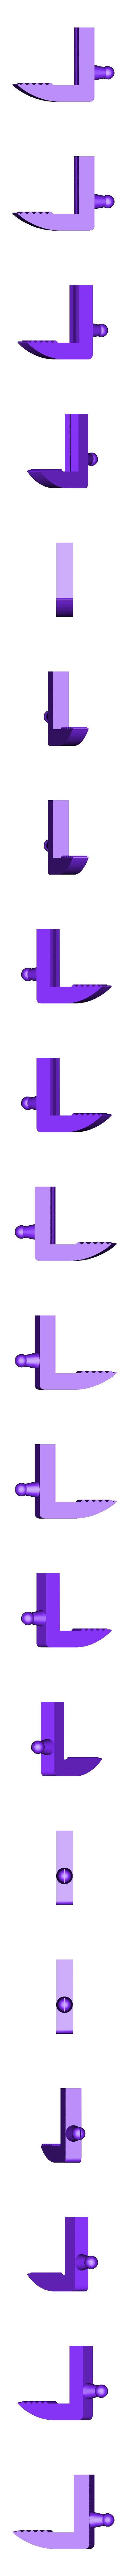 Croc_clamp_25mm.STL Download STL file Crocodile Vise Clamps (attachment for Solder Helper Hands) • 3D printing design, benspawn